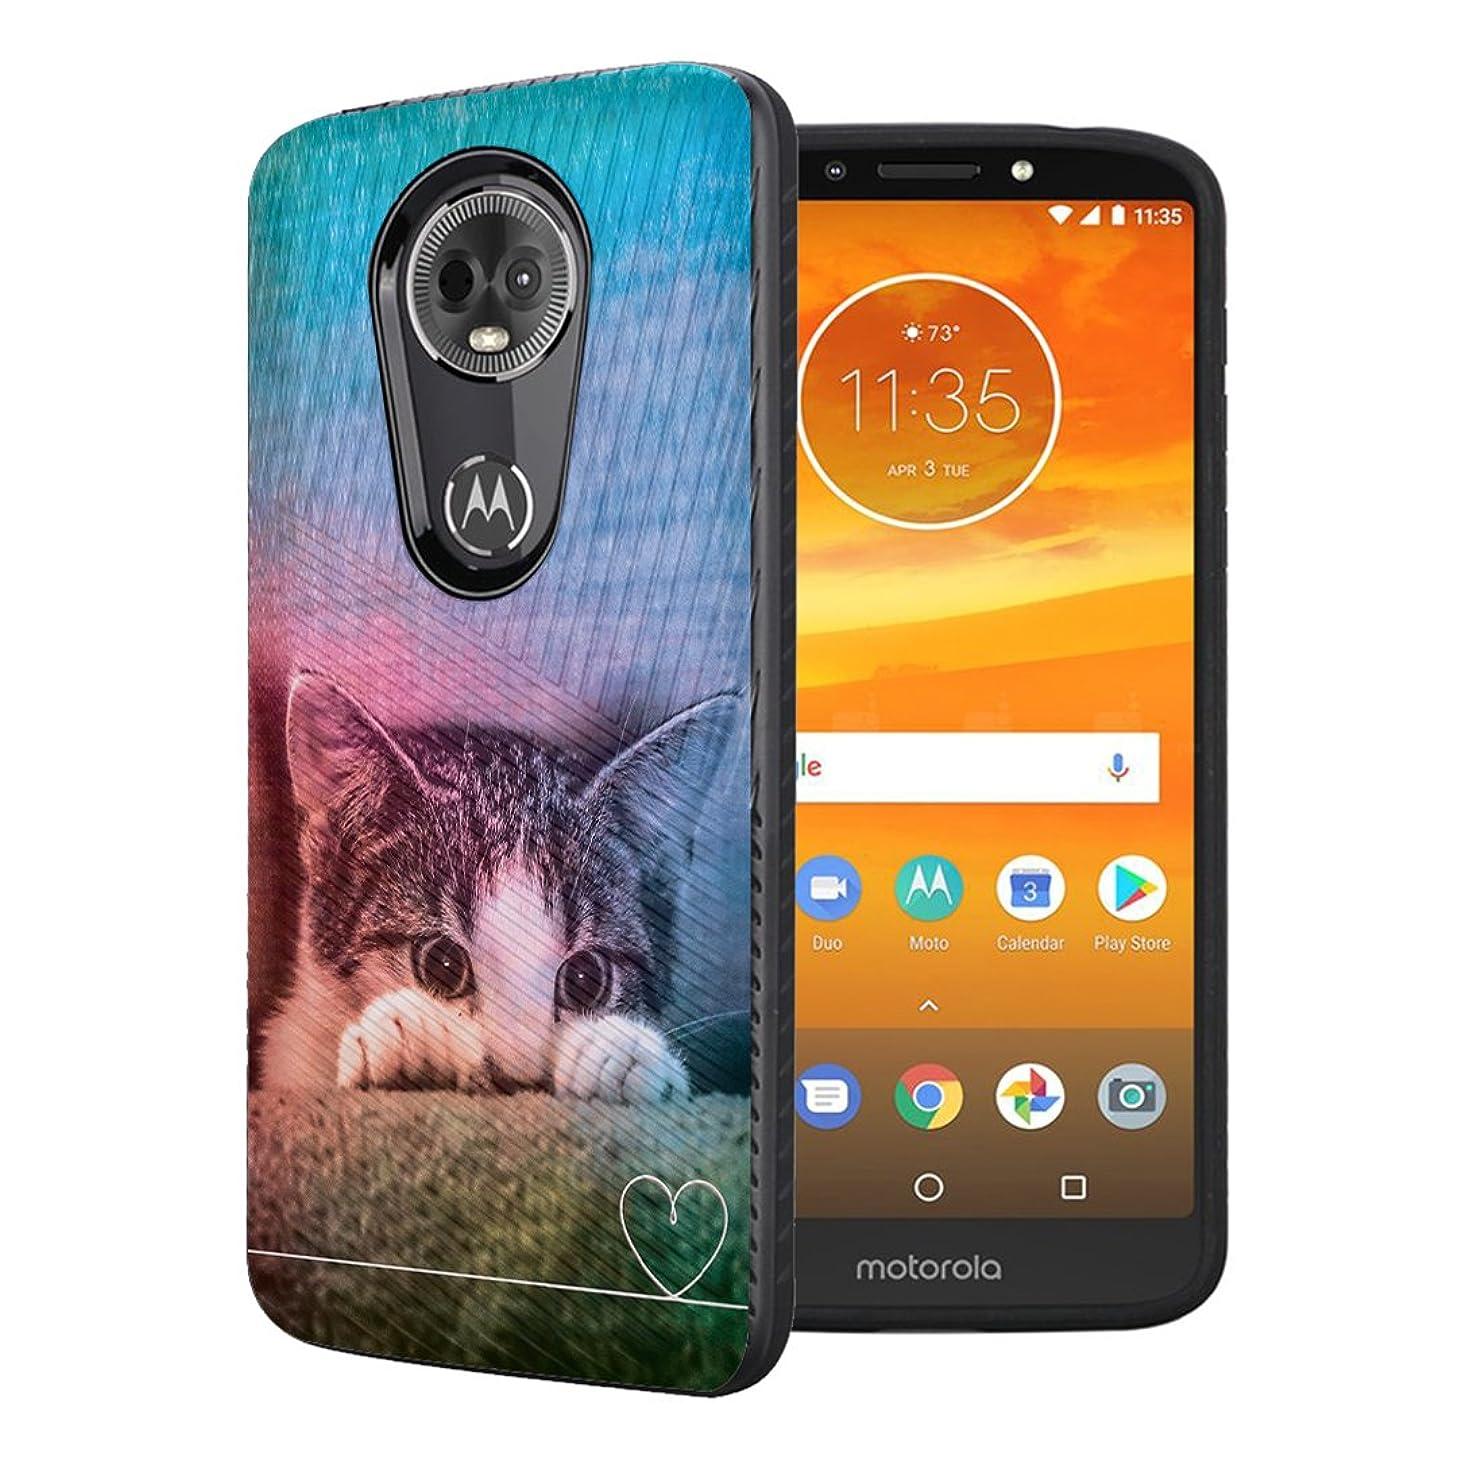 Moriko Case Compatible with Moto G7 Power, Moto G7 Supra [Embossed Diagonal Lines Hybrid Slim Armor Black Case] for Motorola Moto G7 Power - (Kitty Cat)